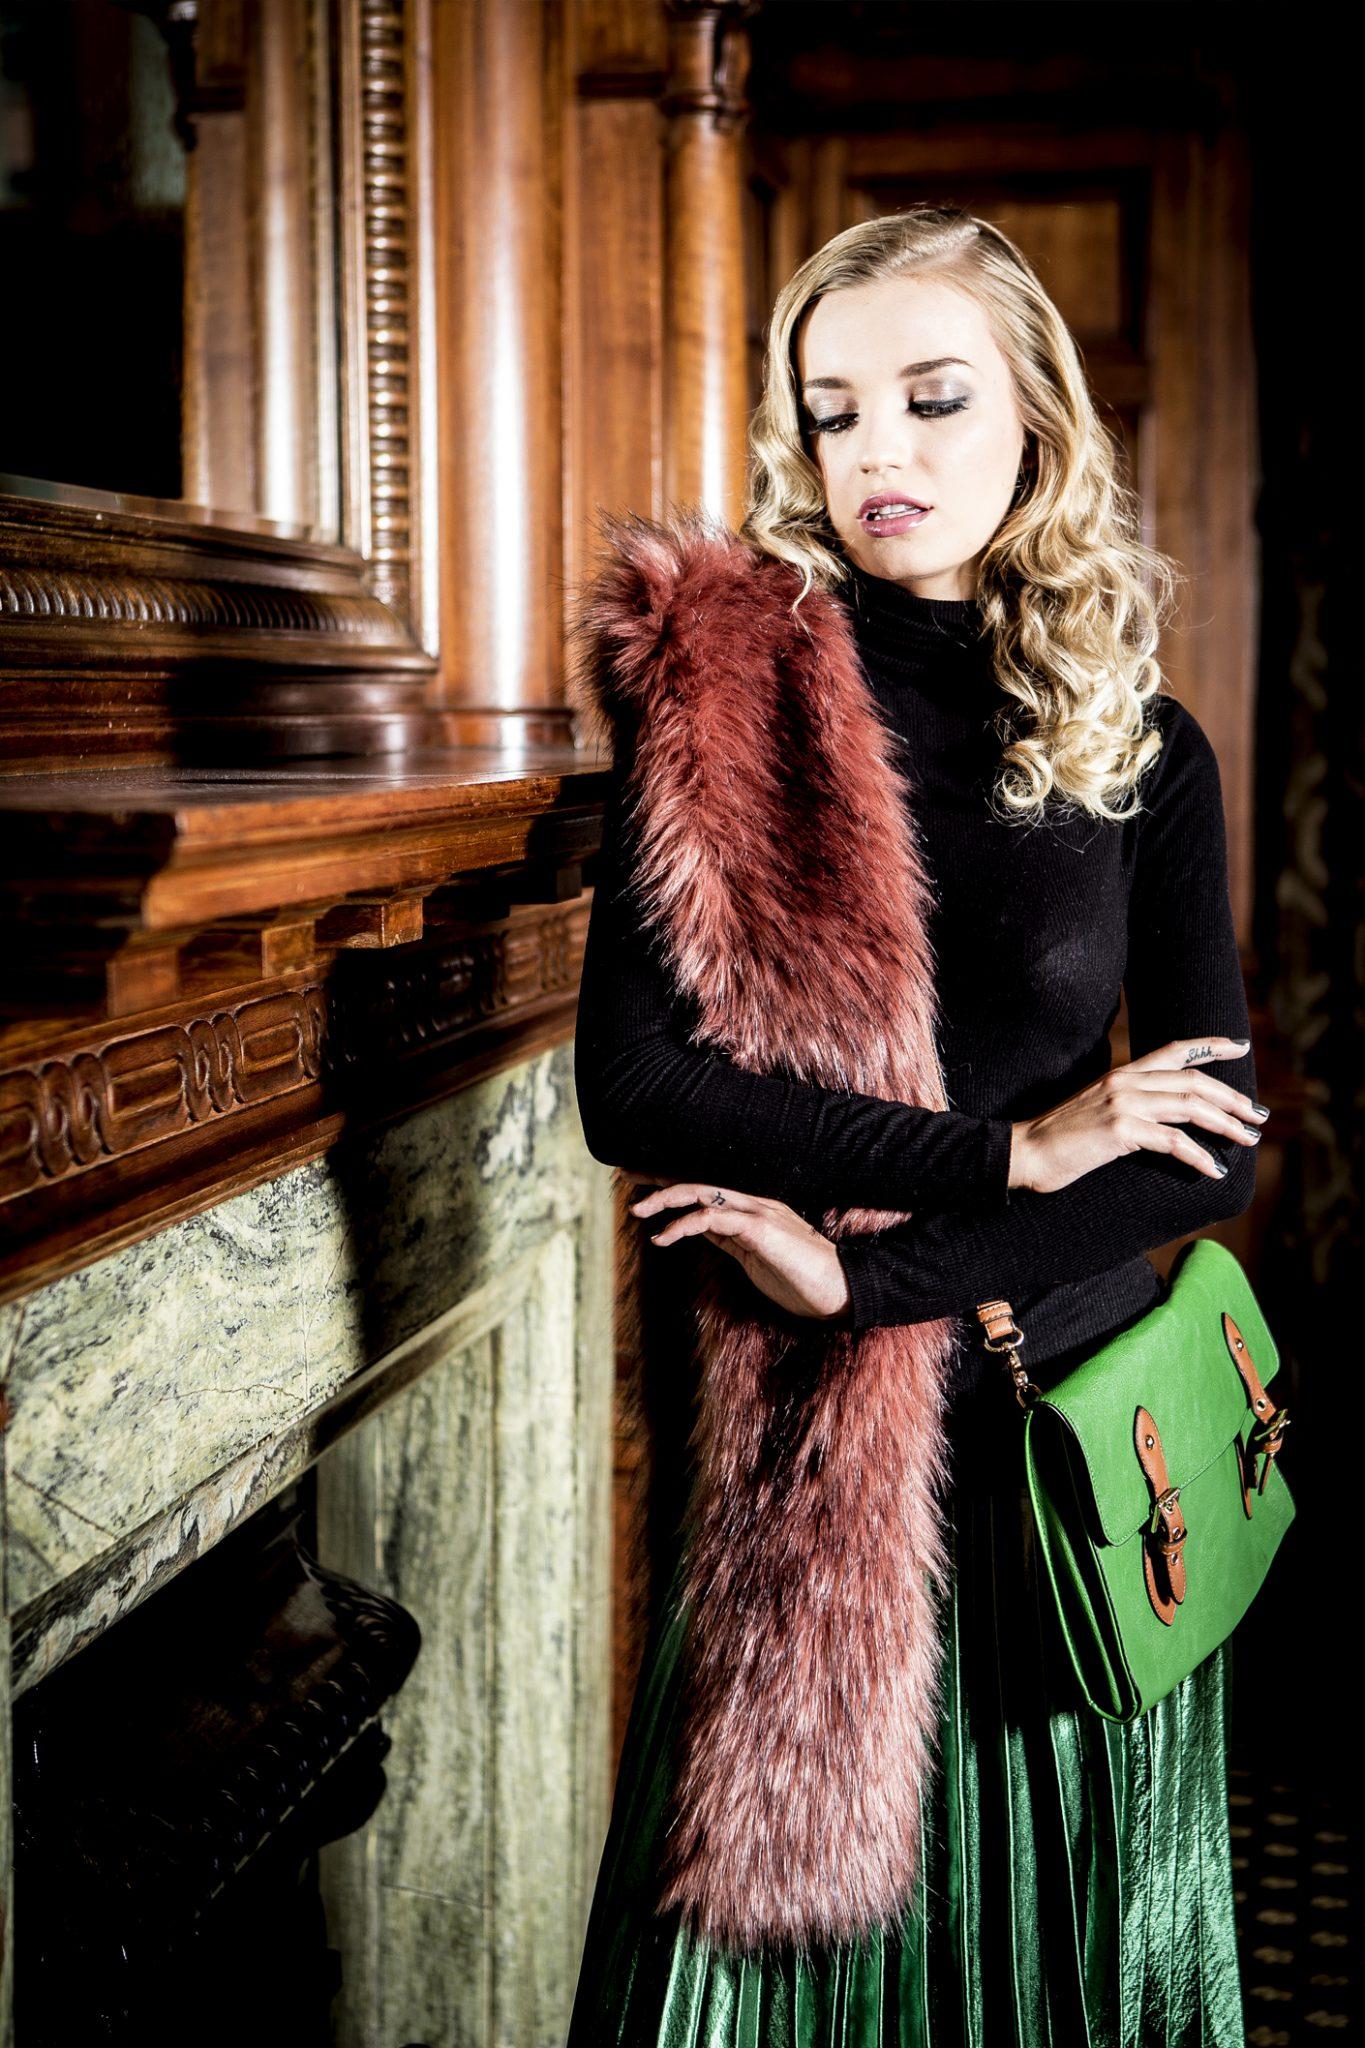 ladieswear-fashion-photography-london-and-manchester